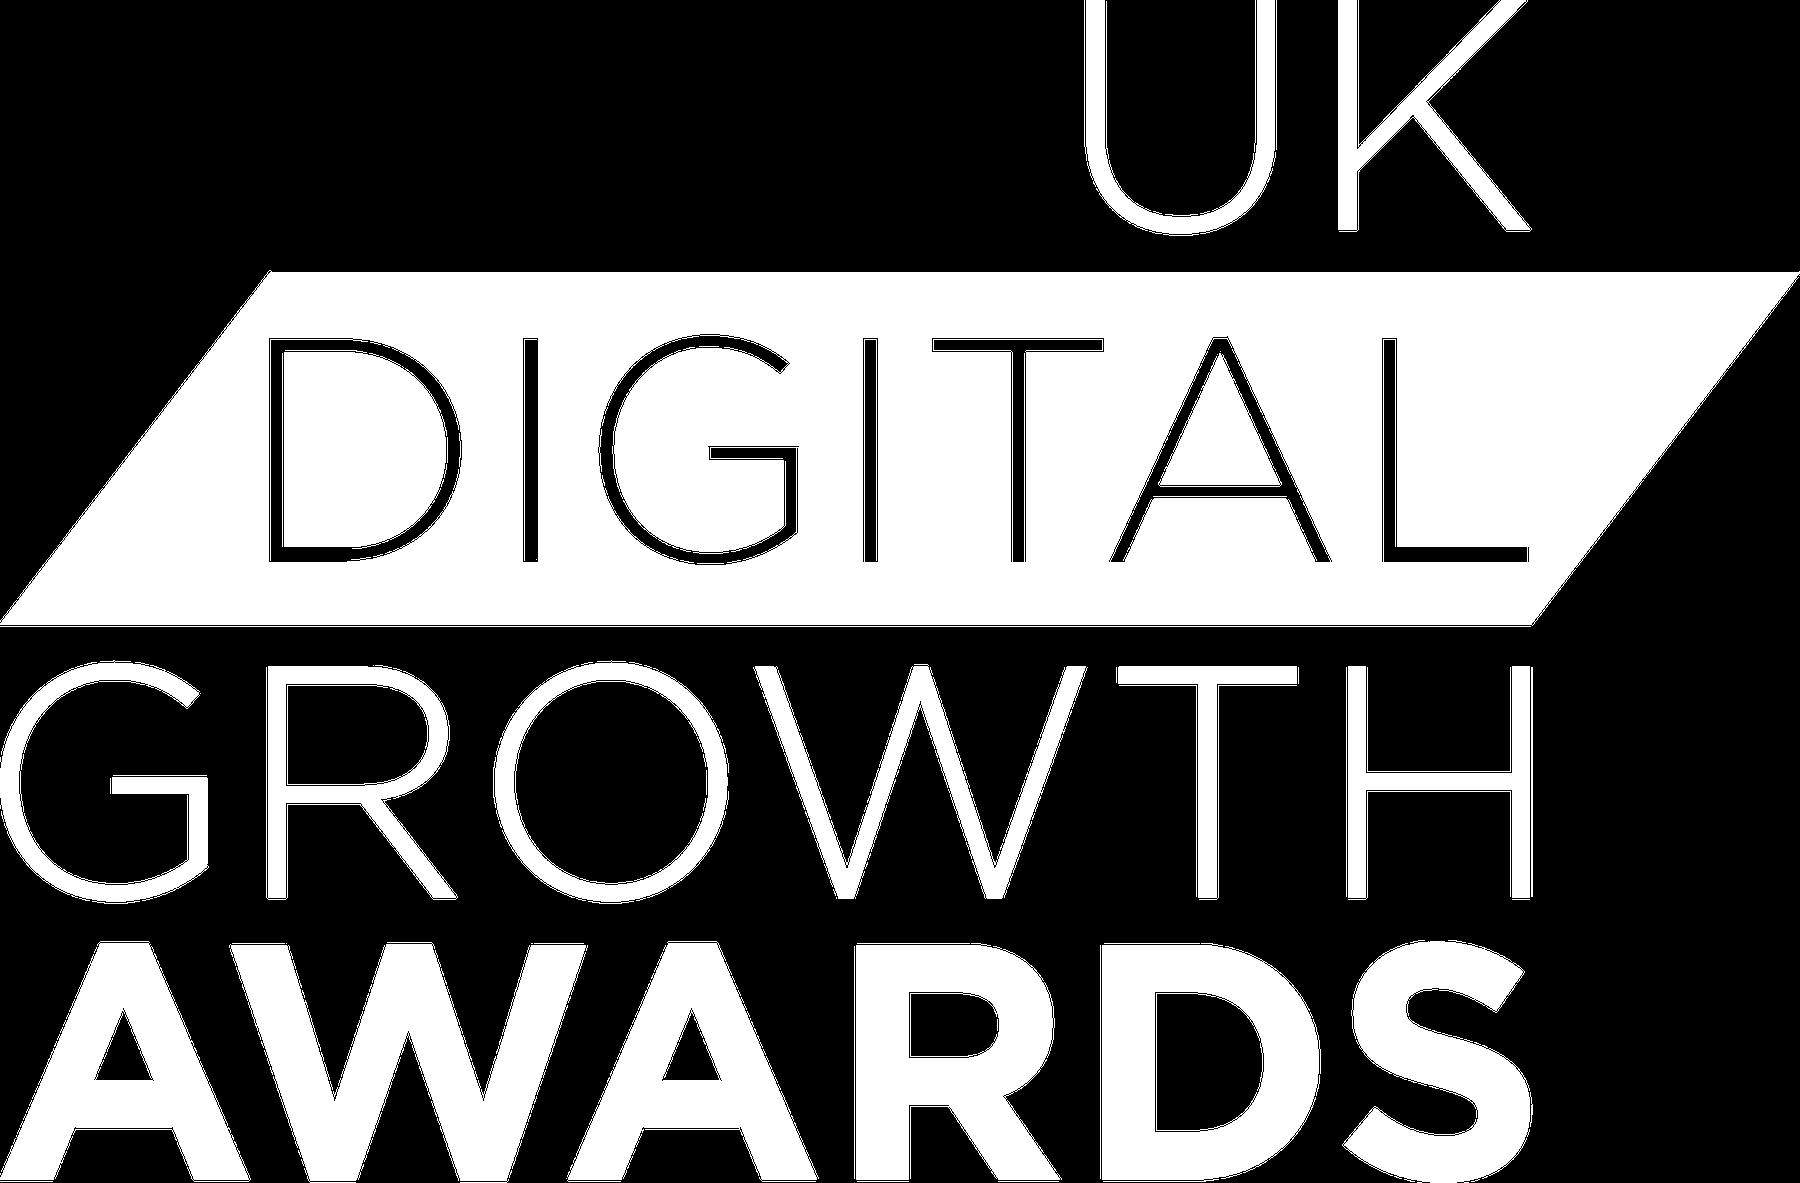 UK Digital Growth Awards logo